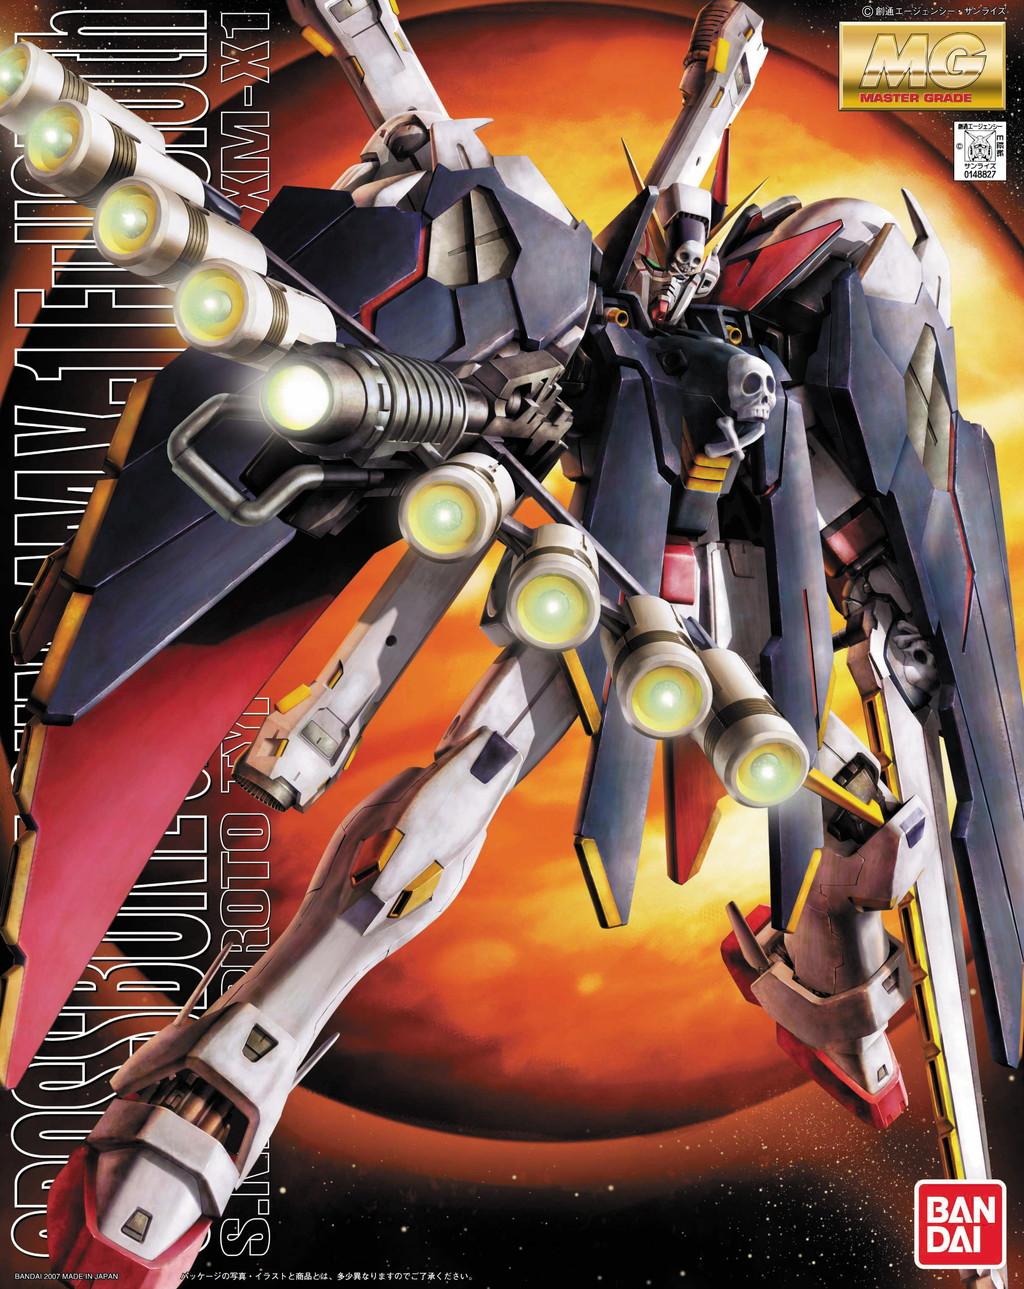 MG 1/100 XM-X1 クロスボーンガンダムX-1フルクロス [Crossbone Gundam X-1 Full Cloth]